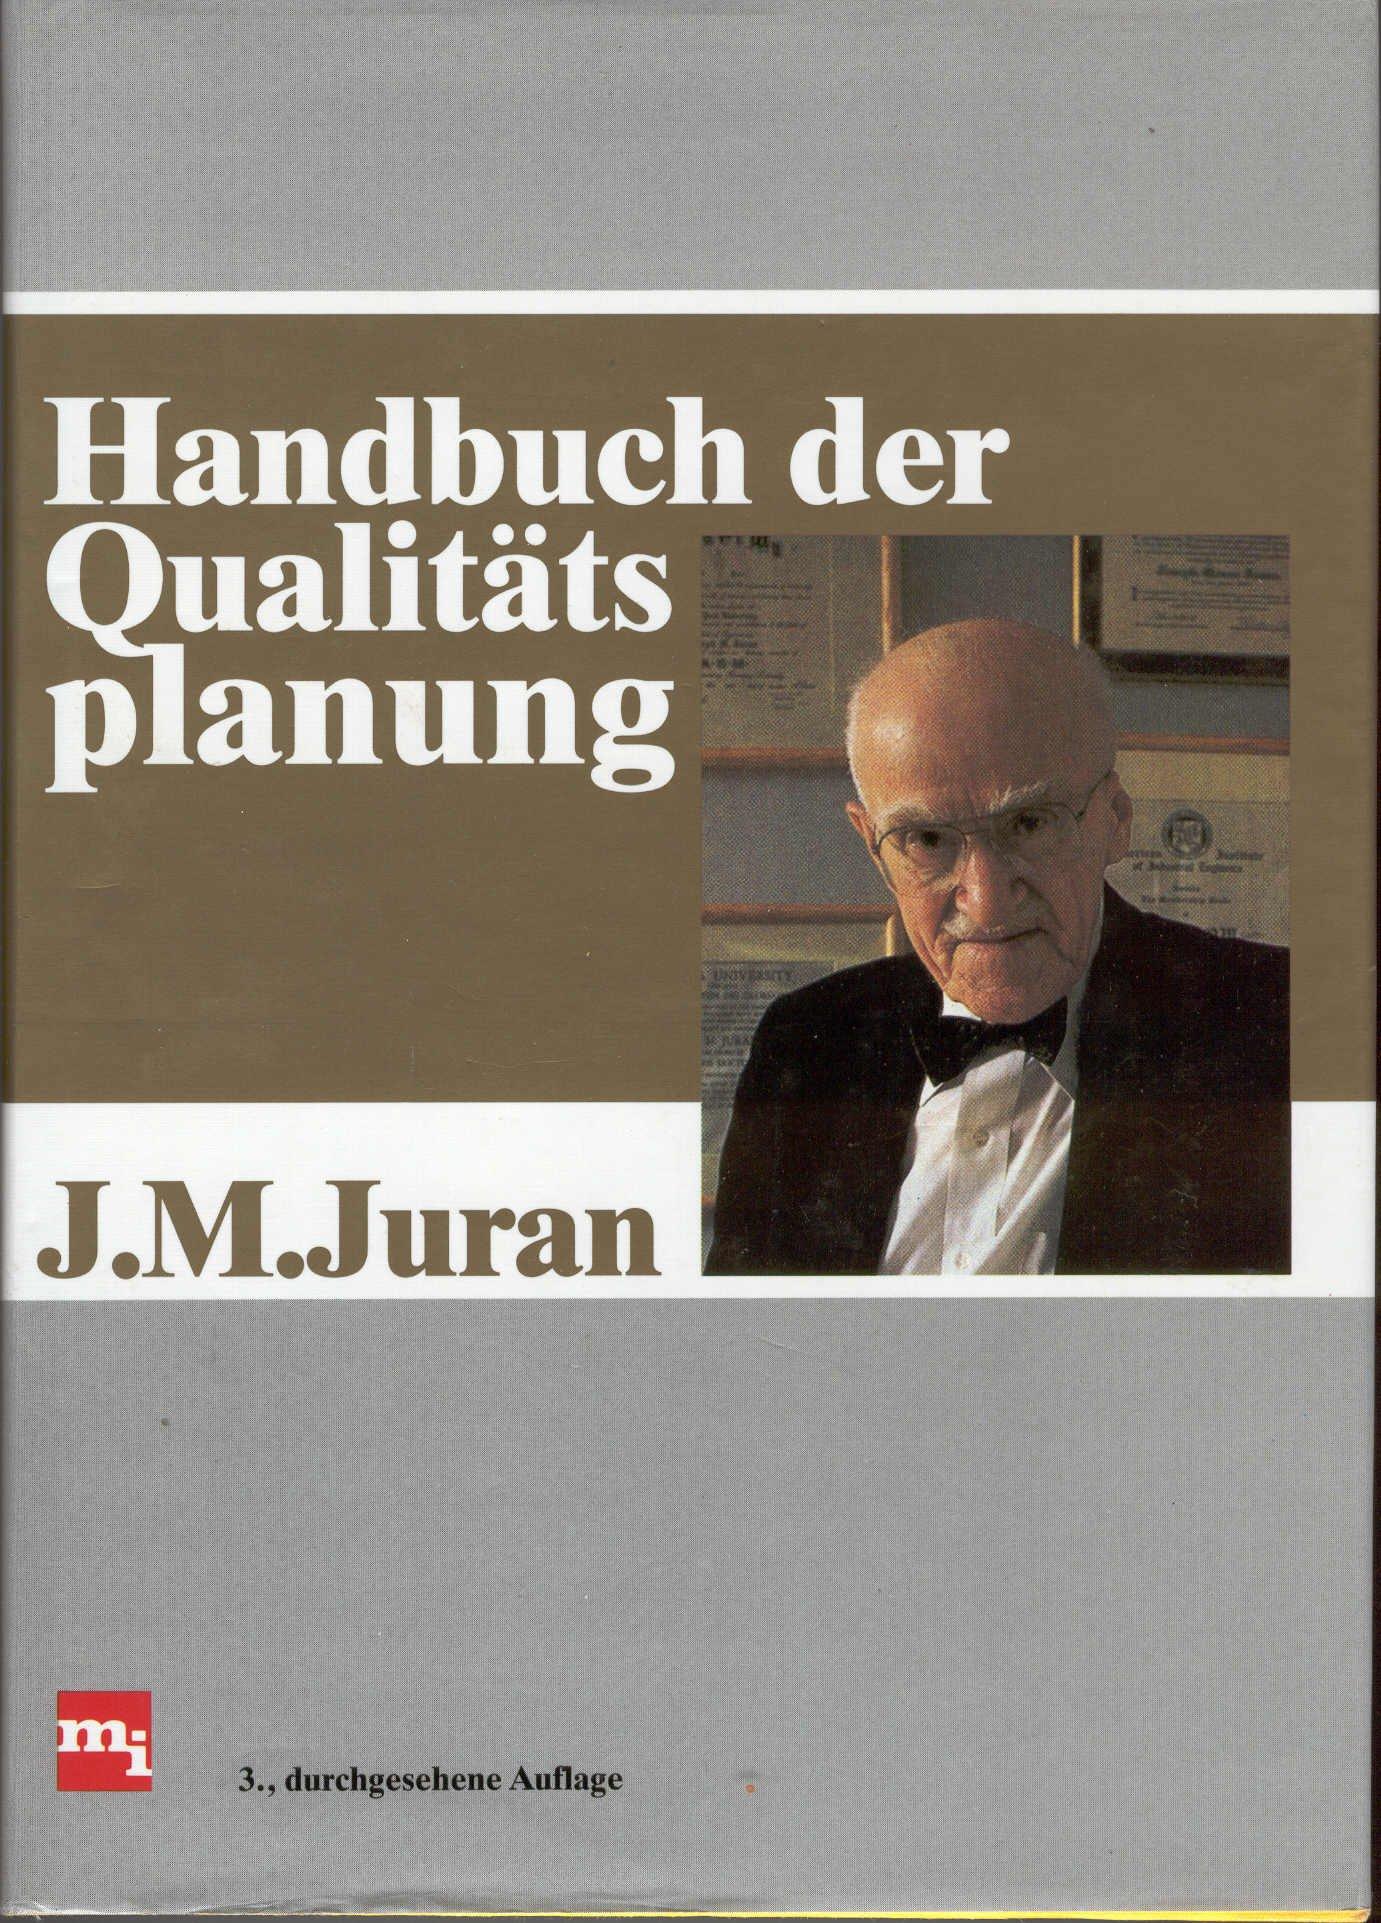 Handbuch der Qualitätsplanung